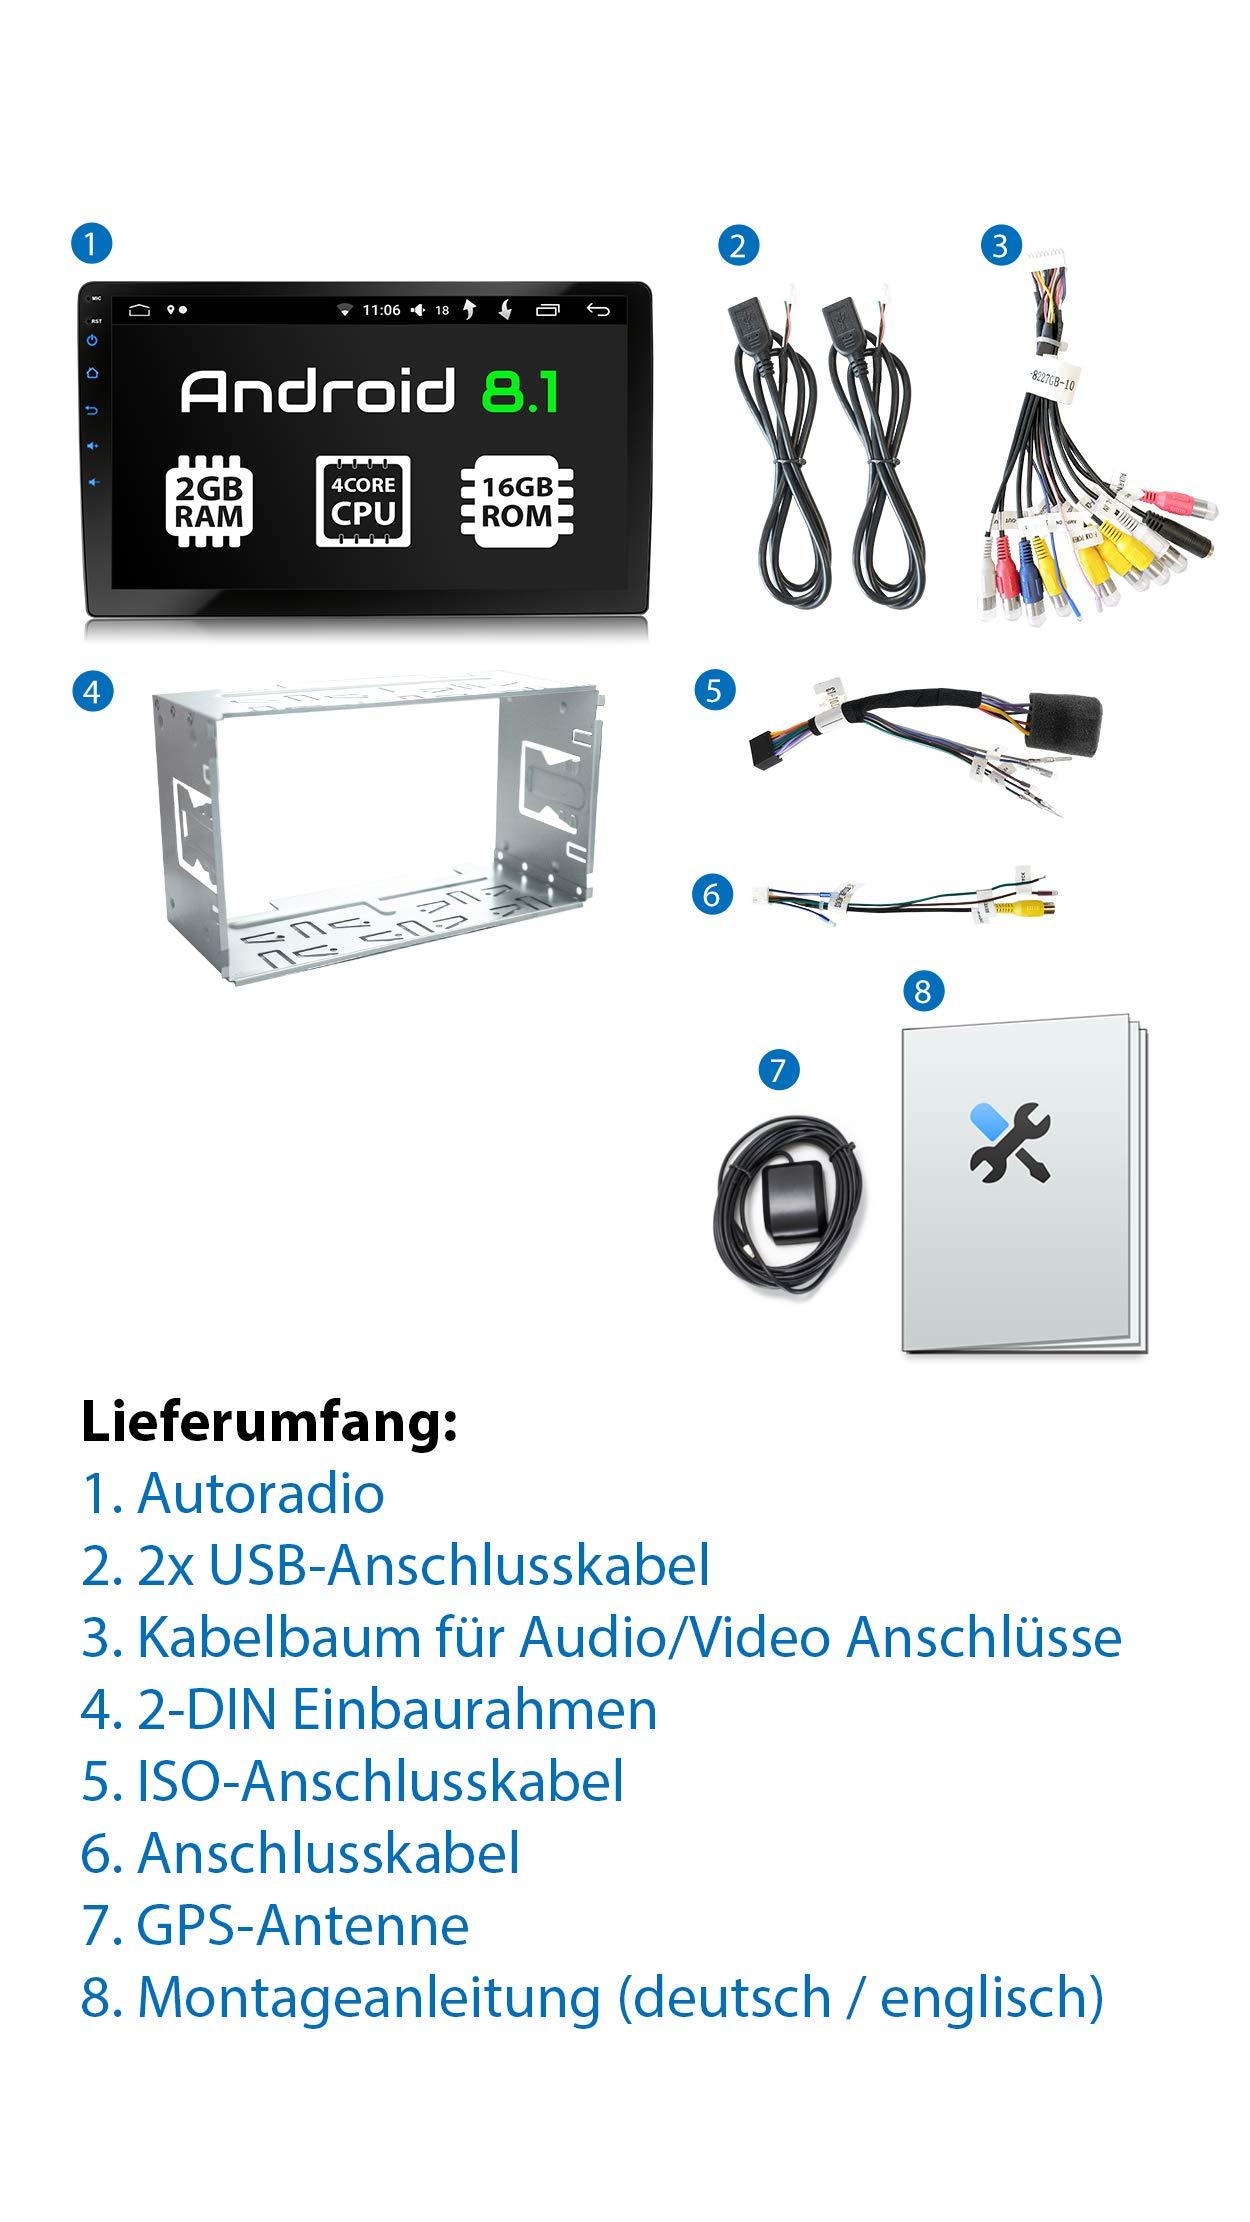 XOMAX-XM-2VA901-Autoradio-mit-Android-81-4Core-2GB-RAM-16GB-ROM-GPS-Navigation-I-Support-WiFi-WLAN-3G-4G-DAB-OBD2-I-Bluetooth-9-Zoll-229cm-XXL-Touchscreen-2X-USB-2-DIN